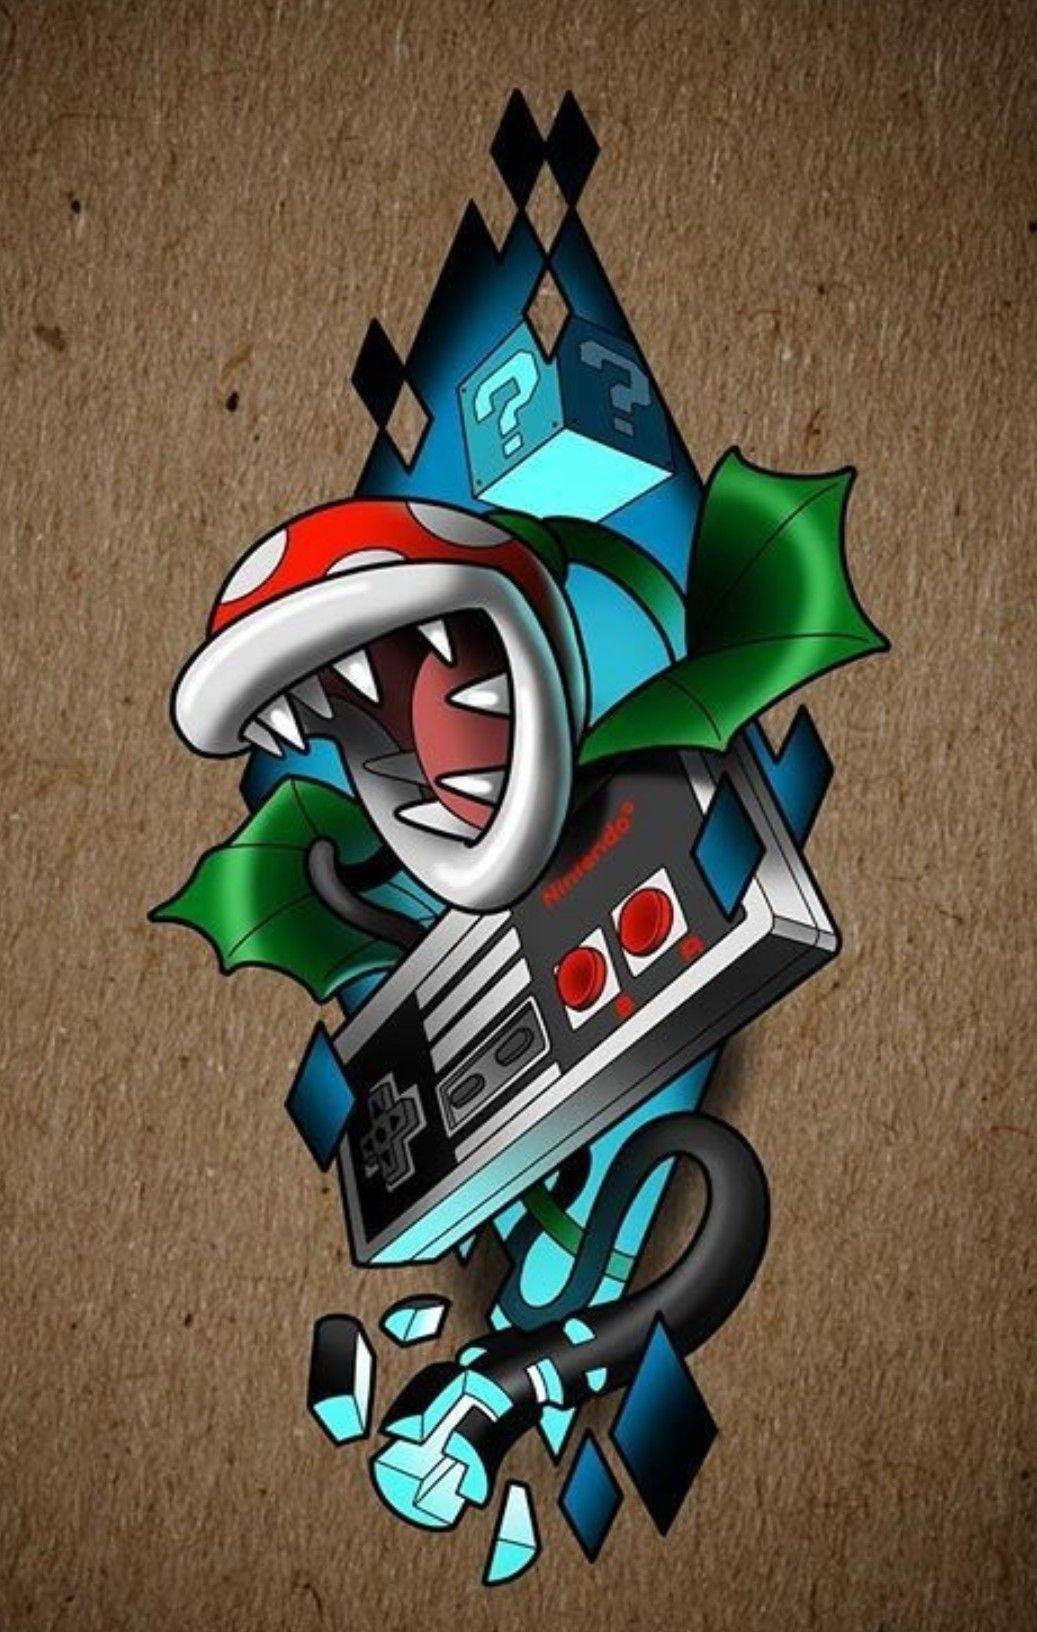 Nintendo Artwork Nes Nintento Nintendo Artwork Fondos De Pantalla De Juegos Tatuajes De Videojuegos Tatuaje De Juegos